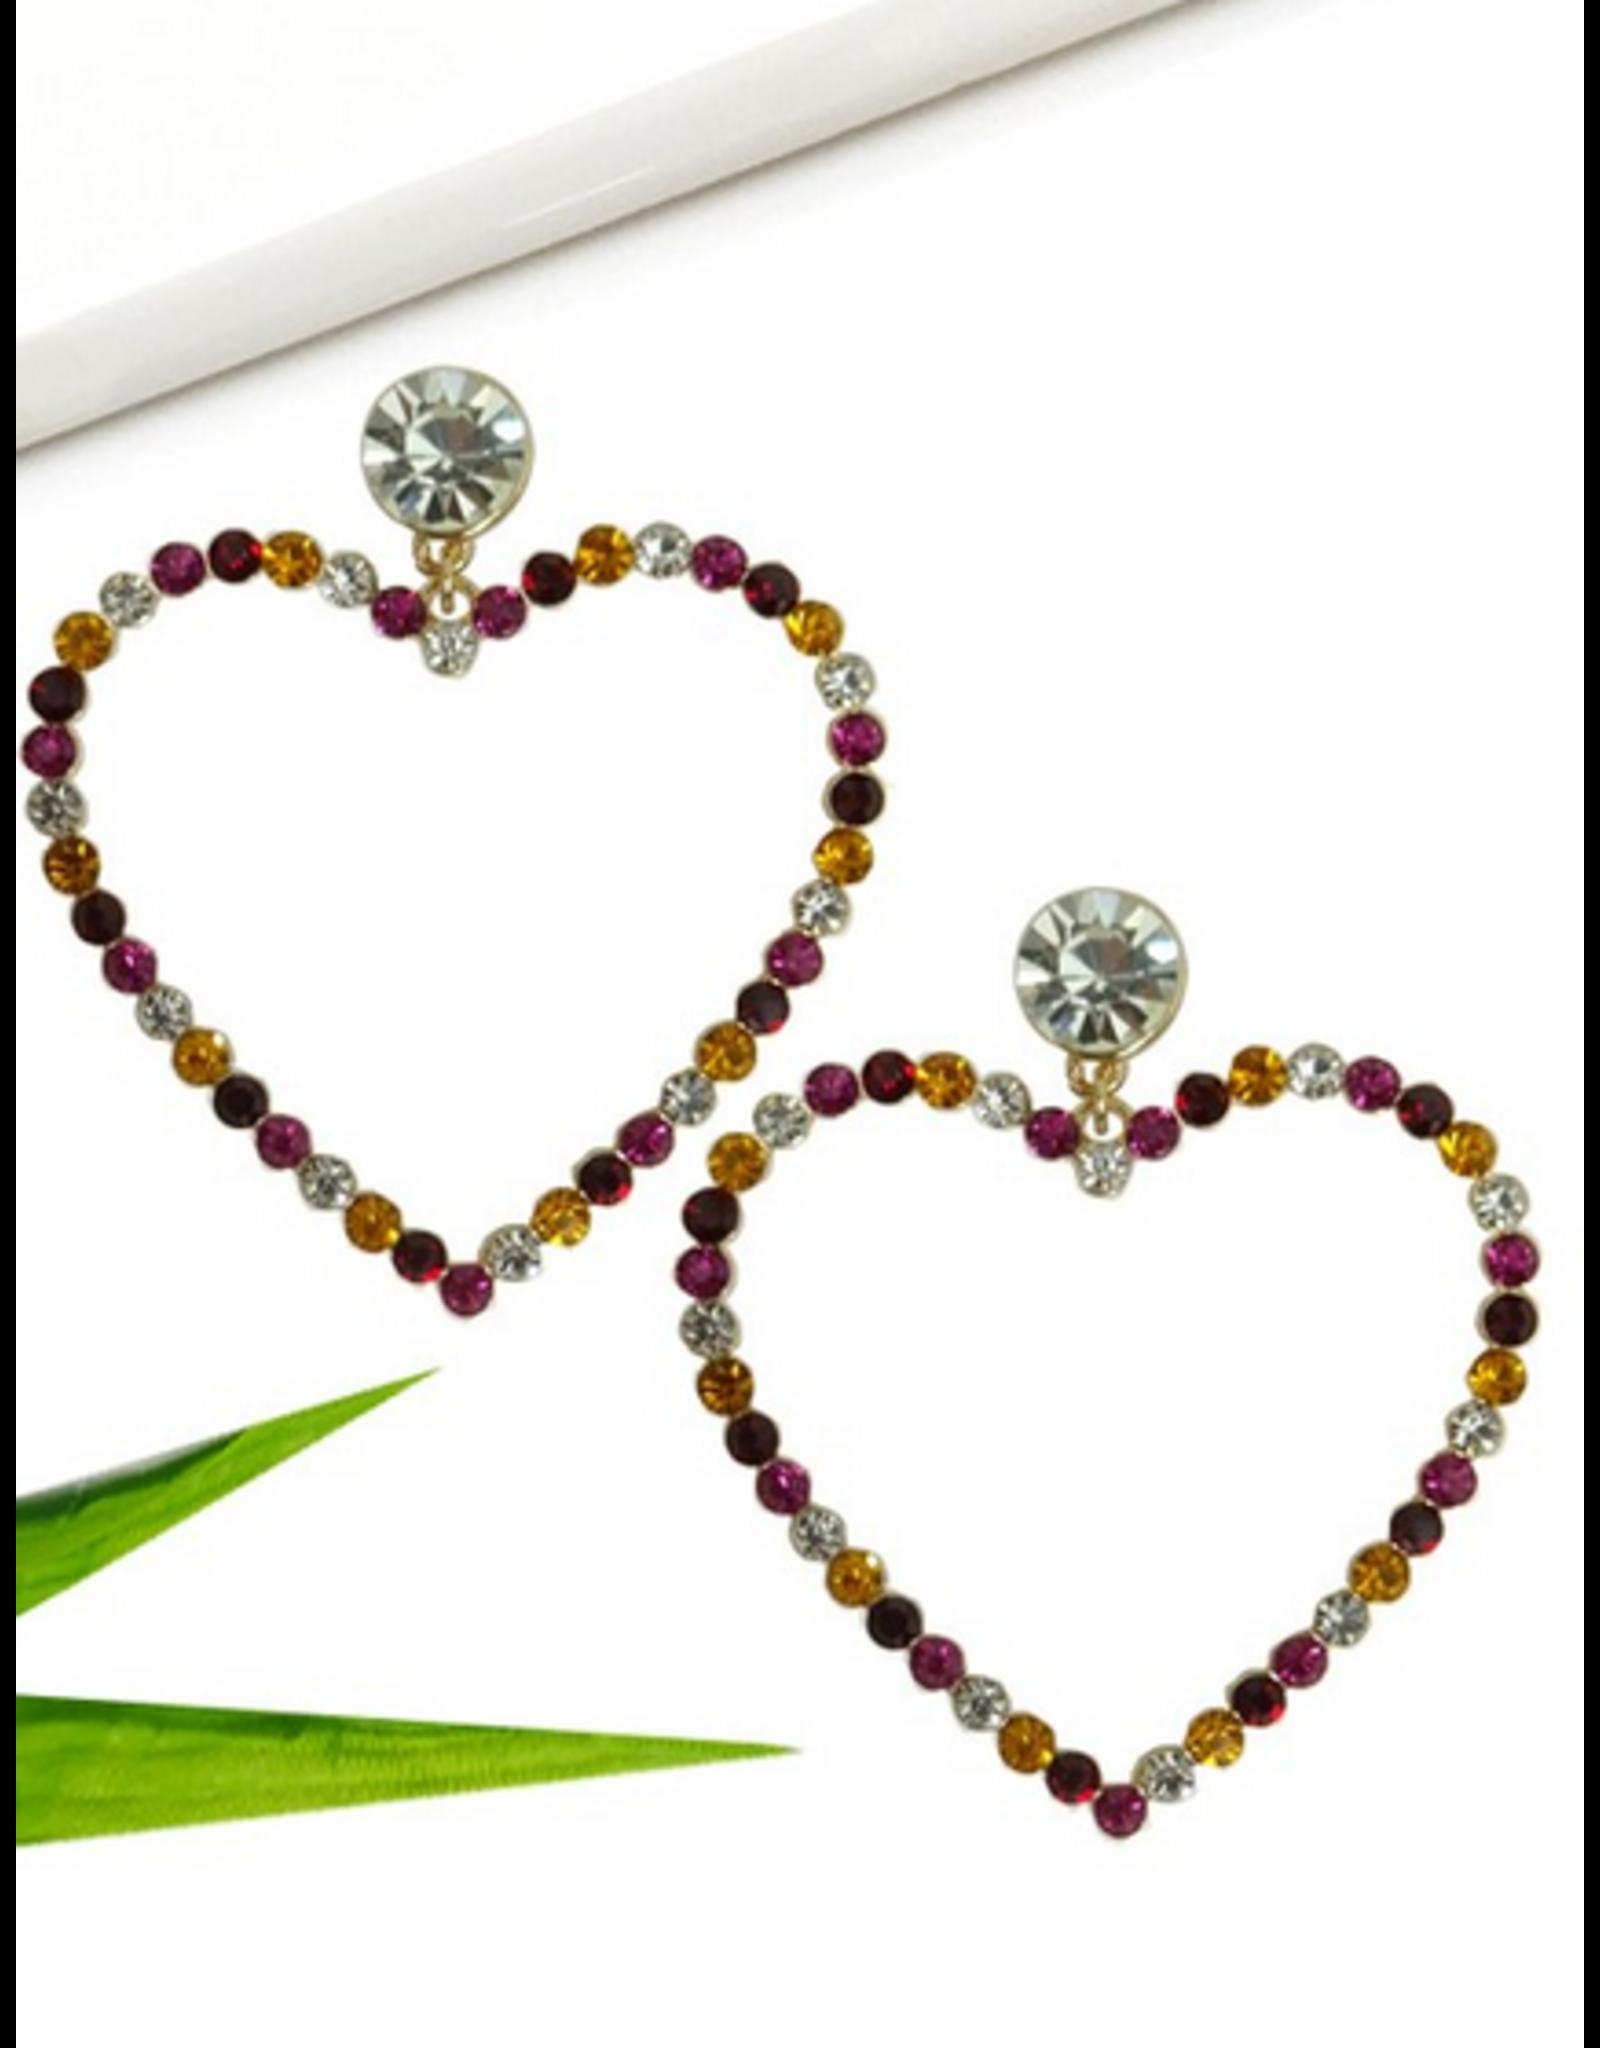 Wall to Wall Drop Heart shaped Rhinestone Earrings